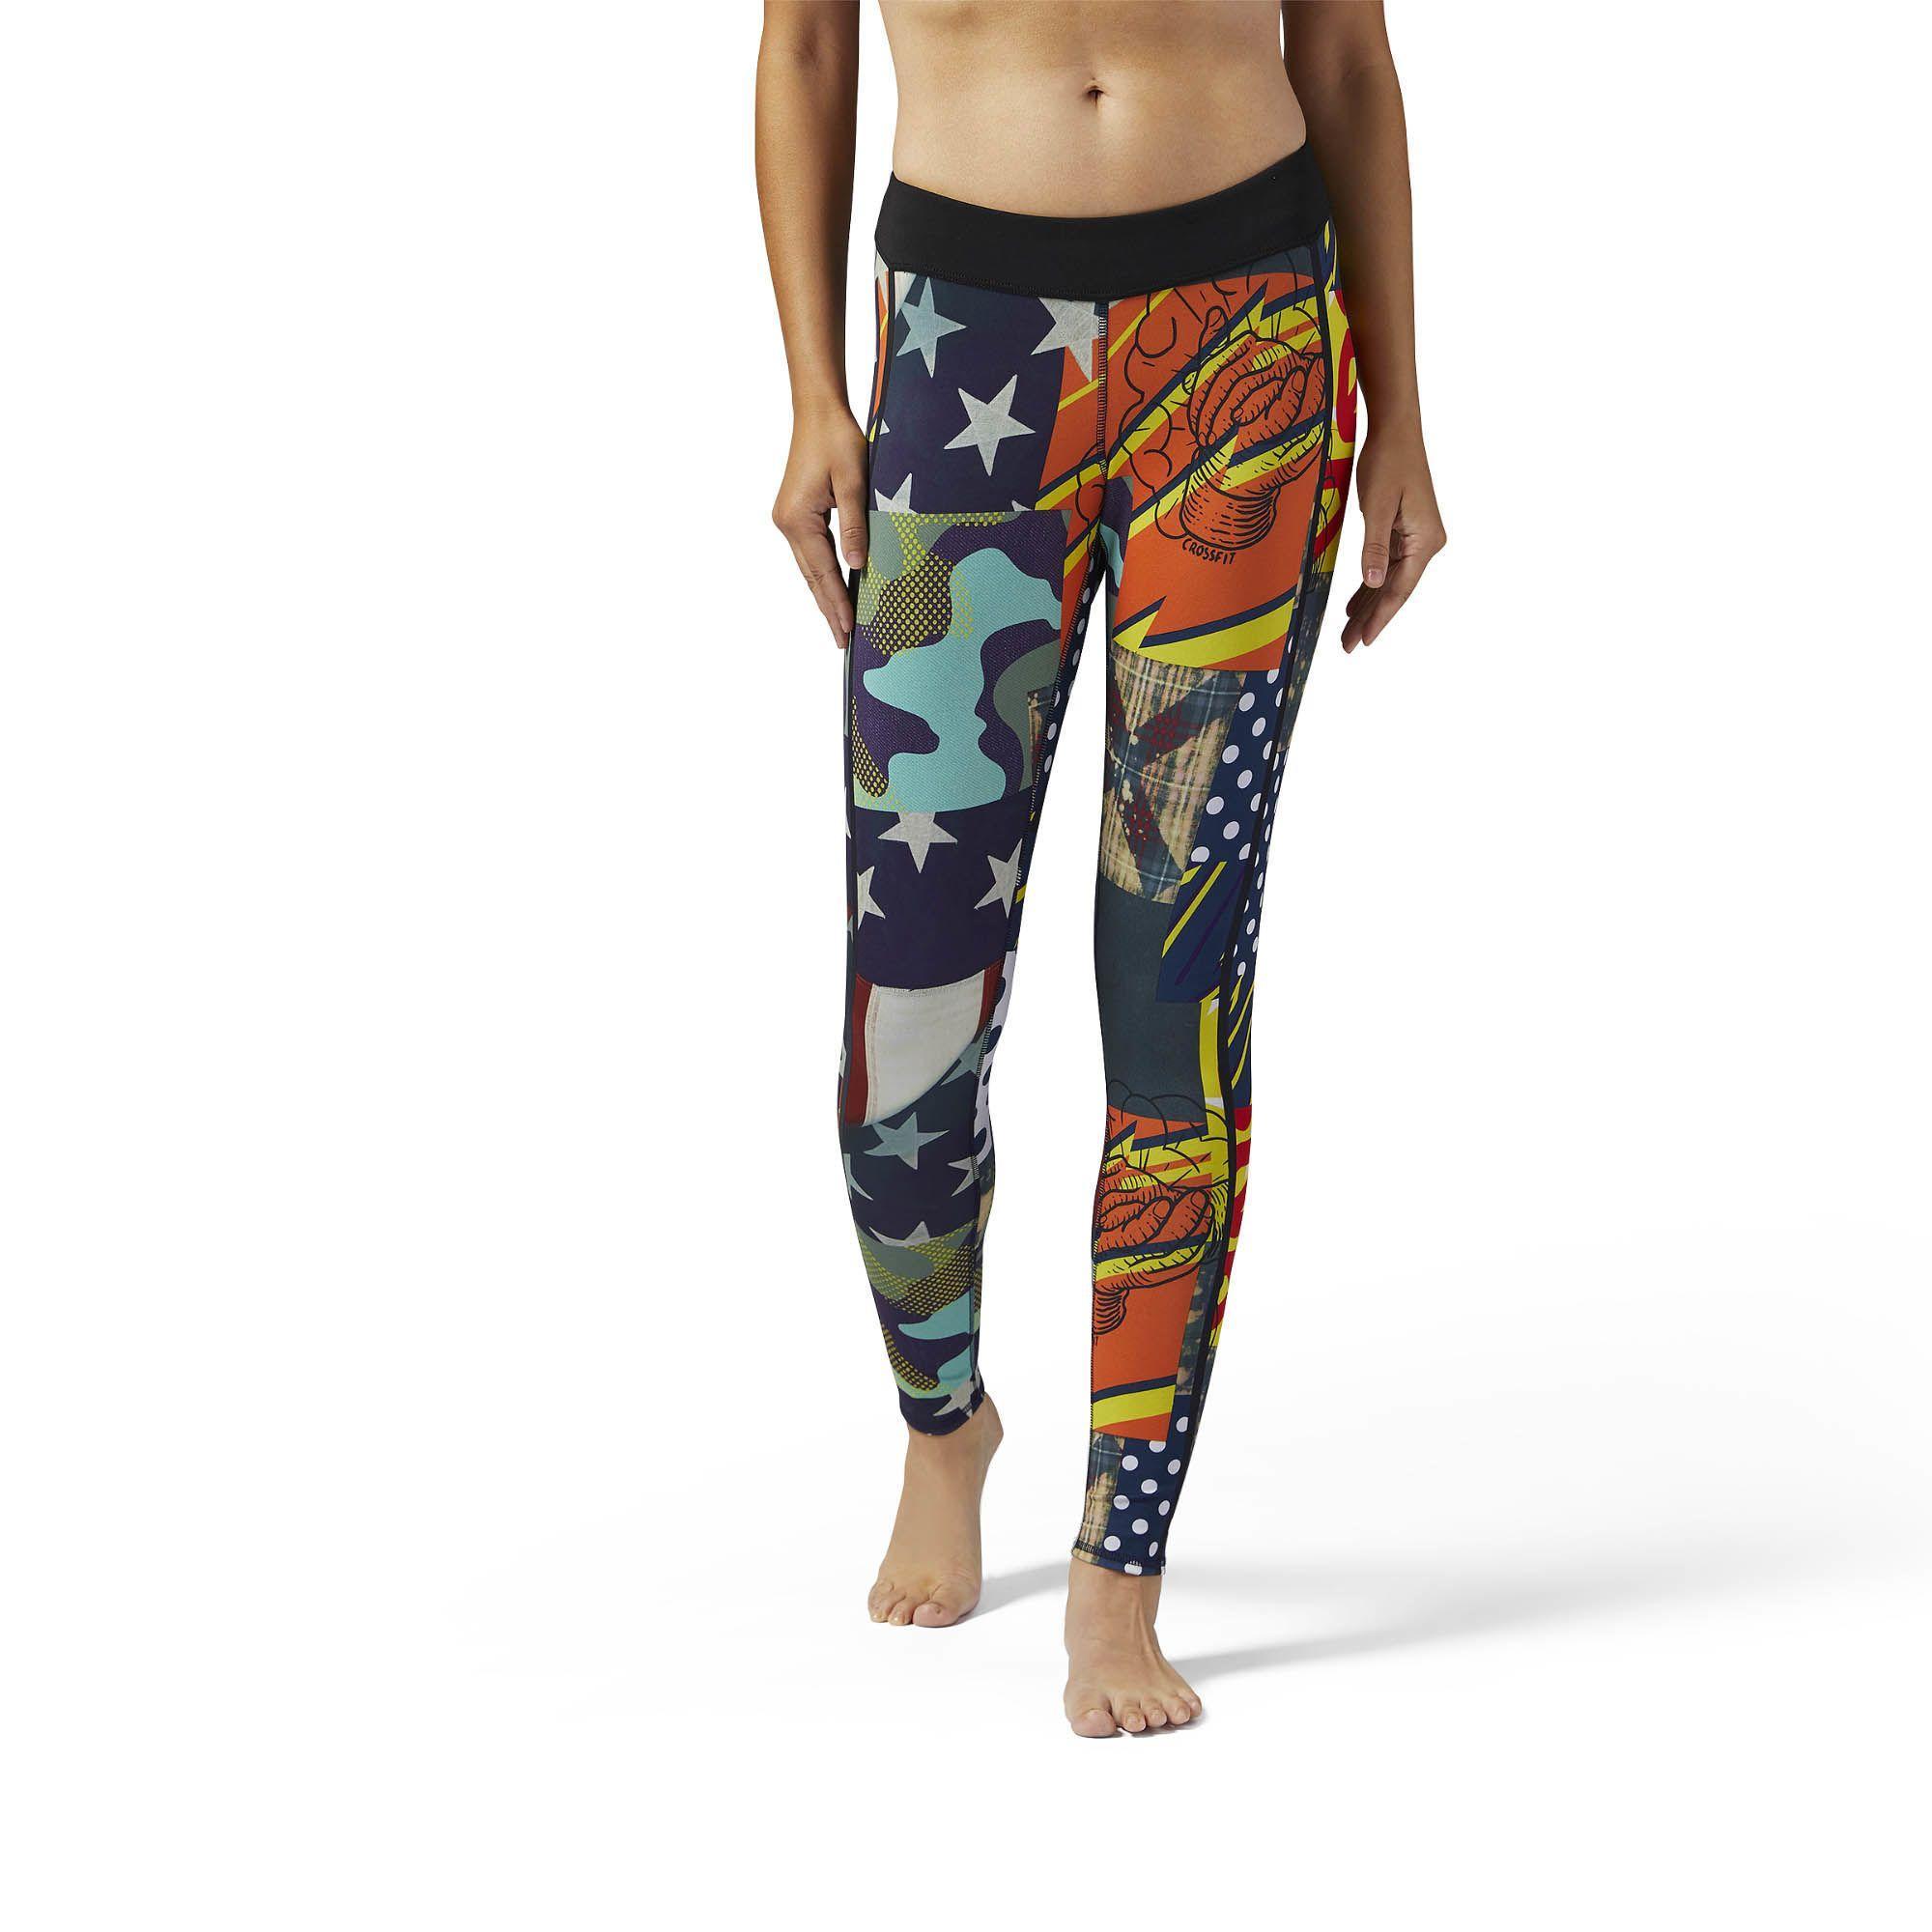 46d943e2fdd1 reebok printed tights